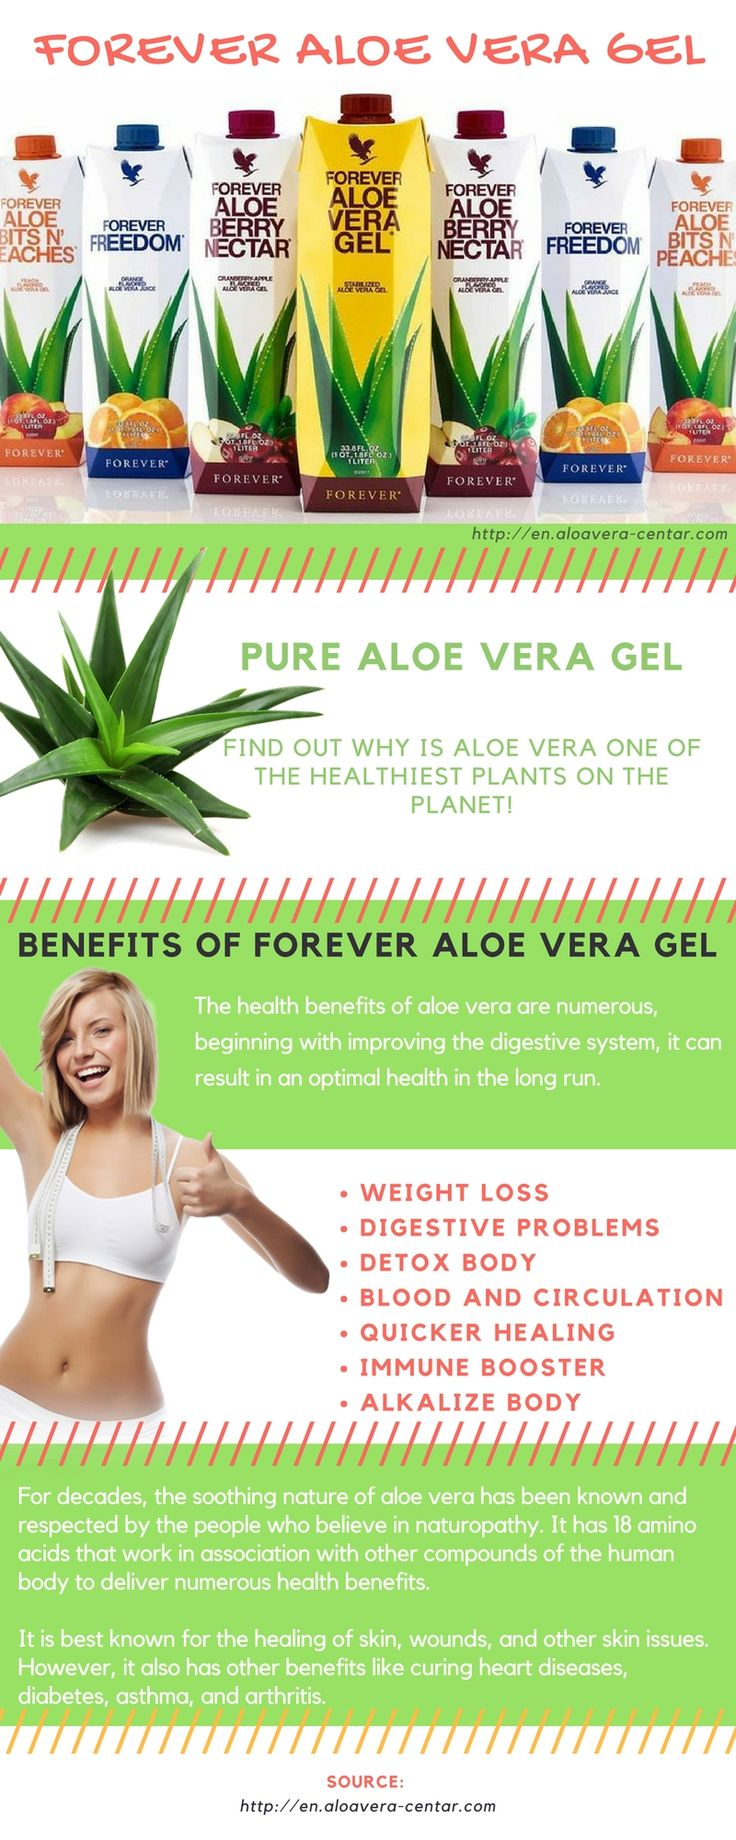 Aloe Vera gel benefits - 100% PURE Aloe Vera